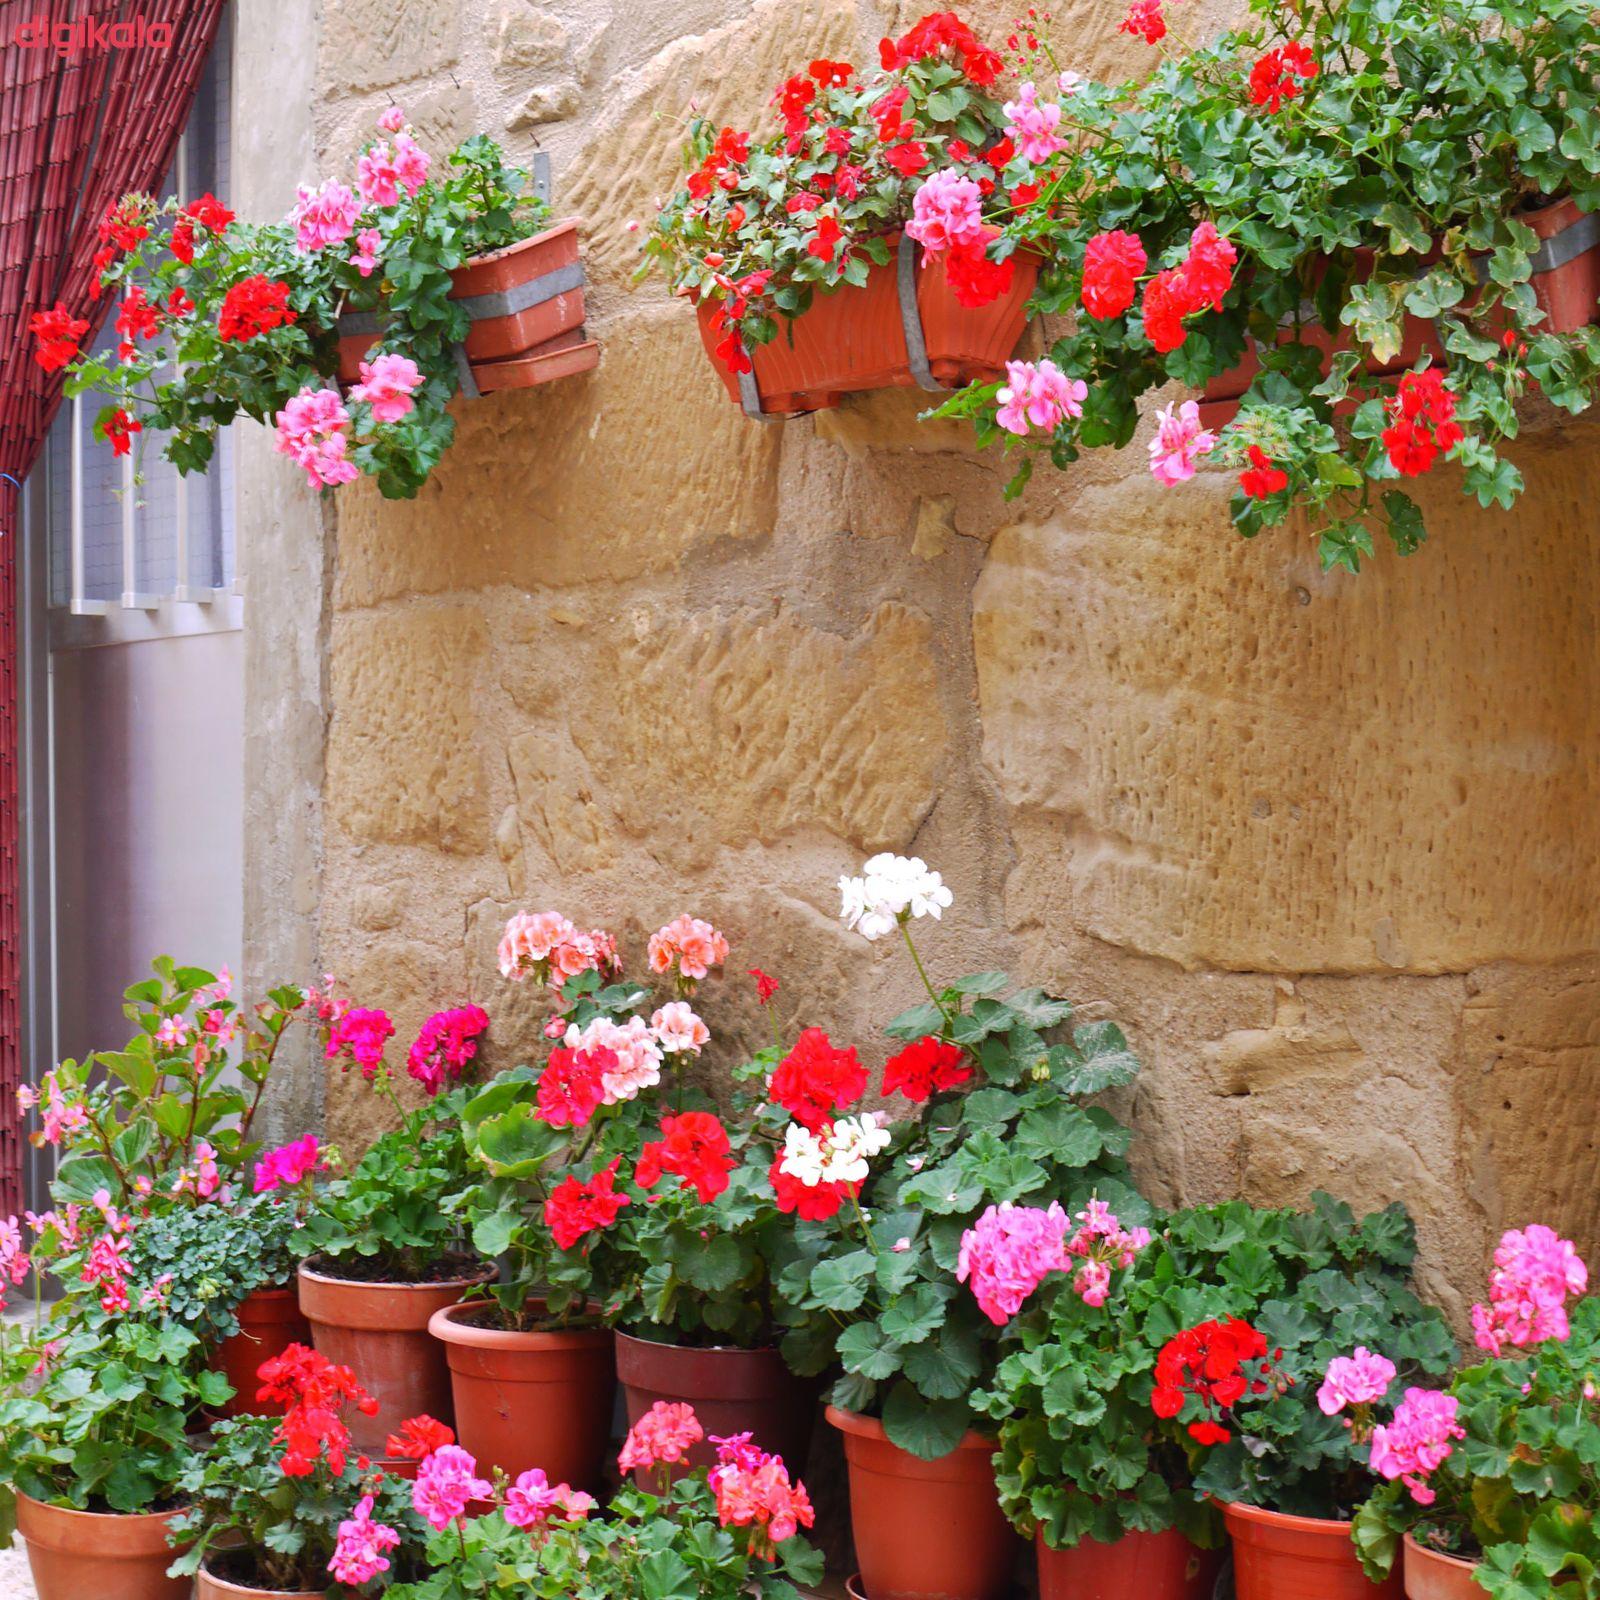 بذر گل شمعدانی پاکوتاه الوان وانیا سید مدل N76 main 1 4